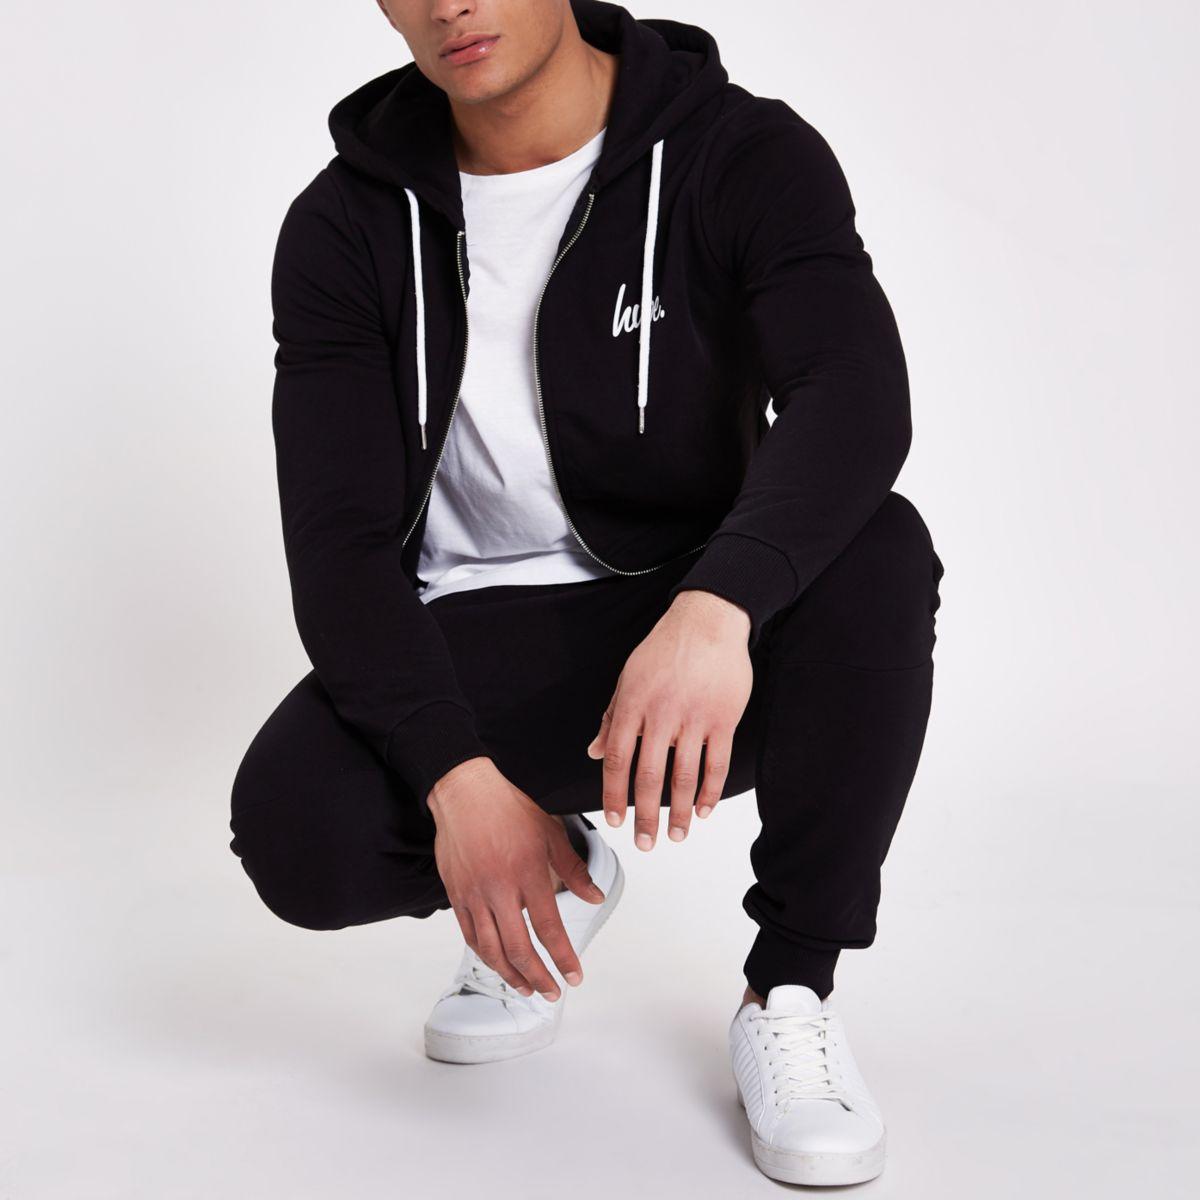 Hype black zip front hoodie